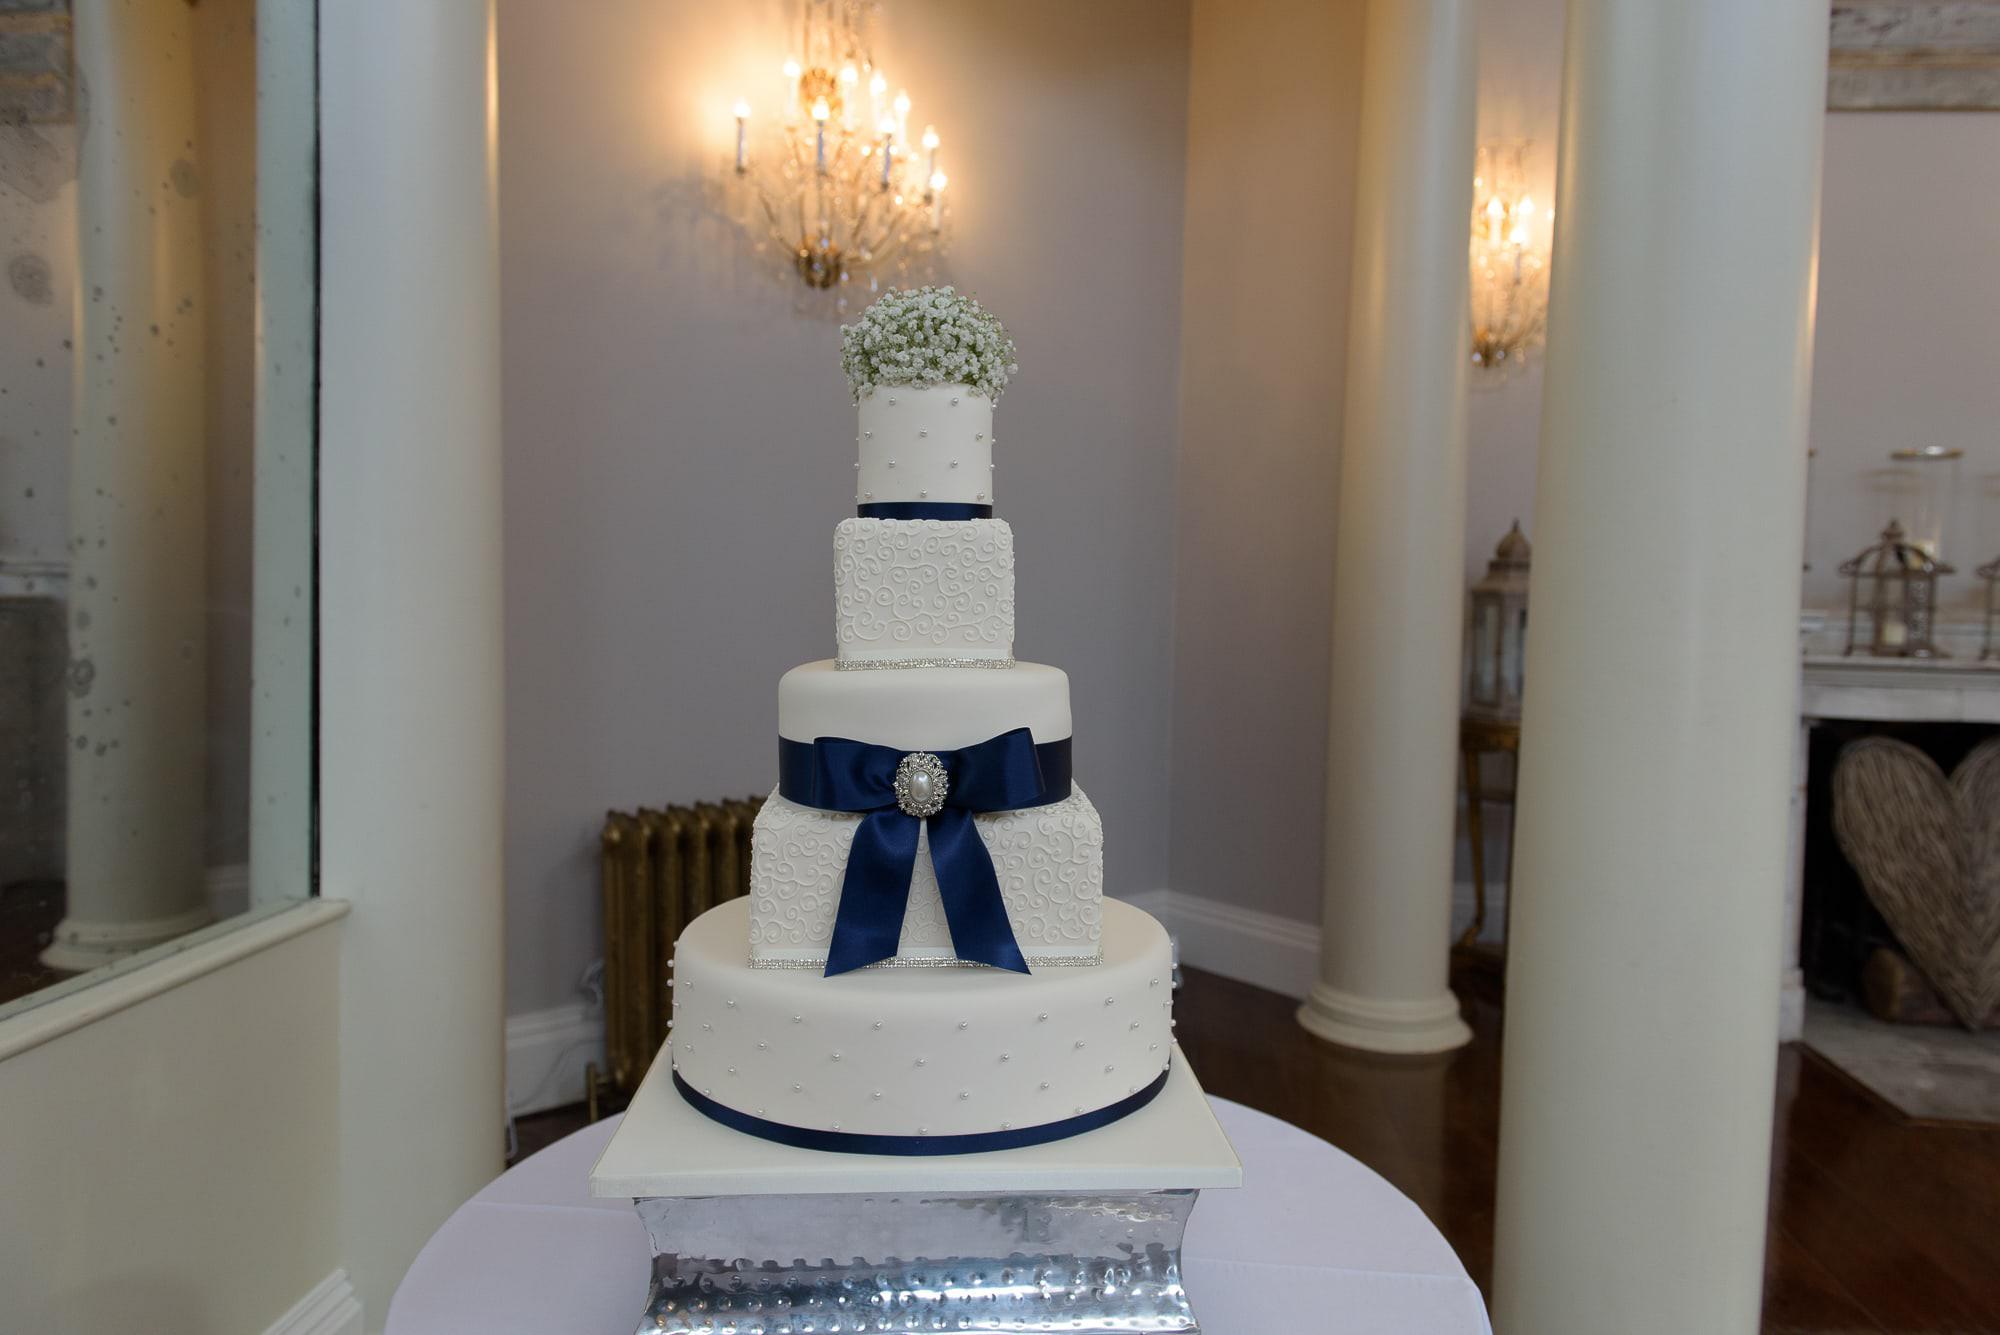 Lartington Hall, Wedding Venue, Wedding Day Photography, Bride and Groom, And Ever After Photography, wedding cake